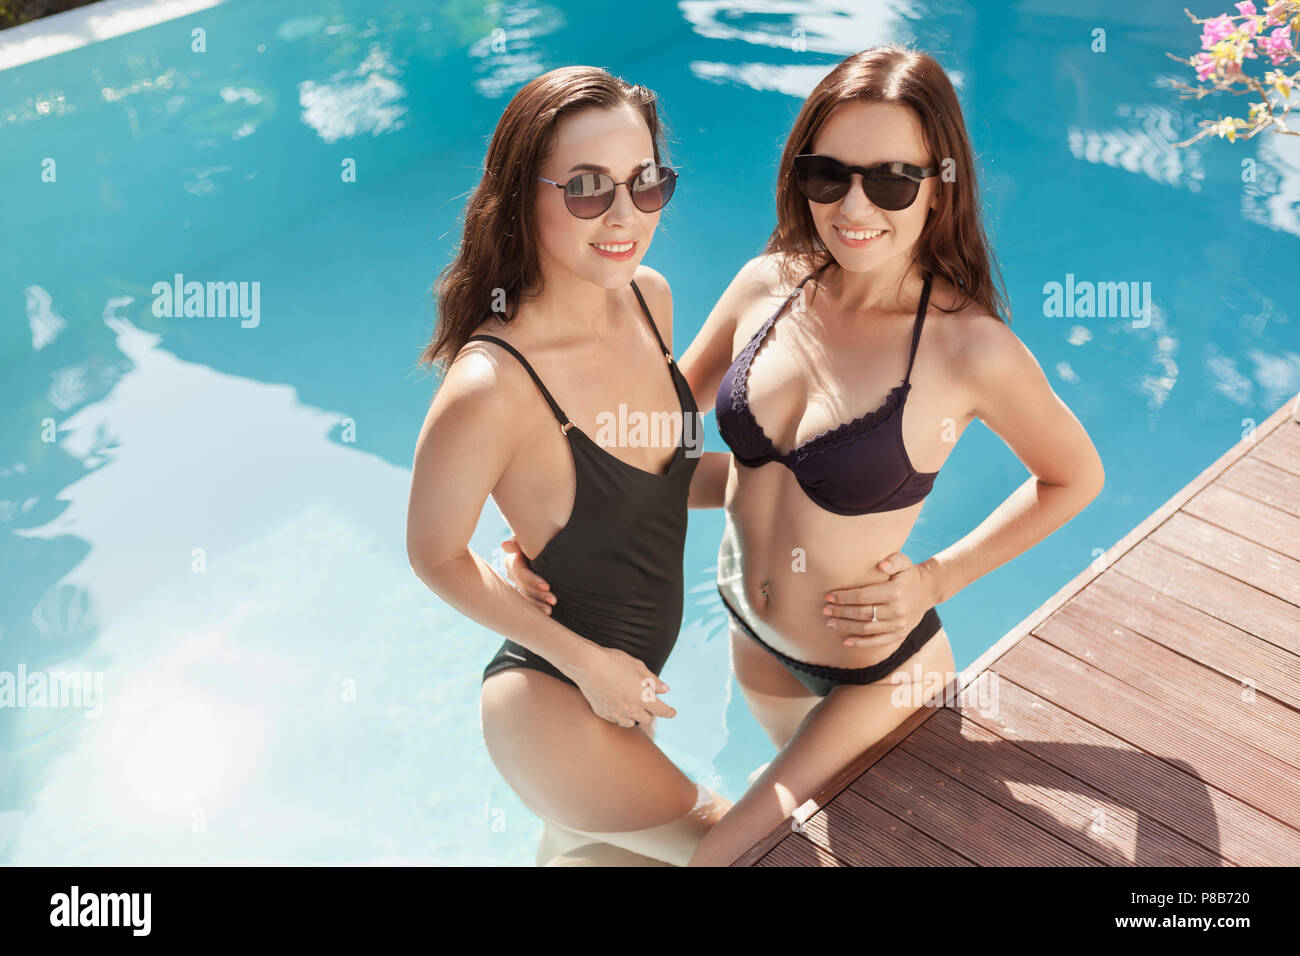 592df9b461cb Models In Bikini Imágenes De Stock & Models In Bikini Fotos De Stock ...